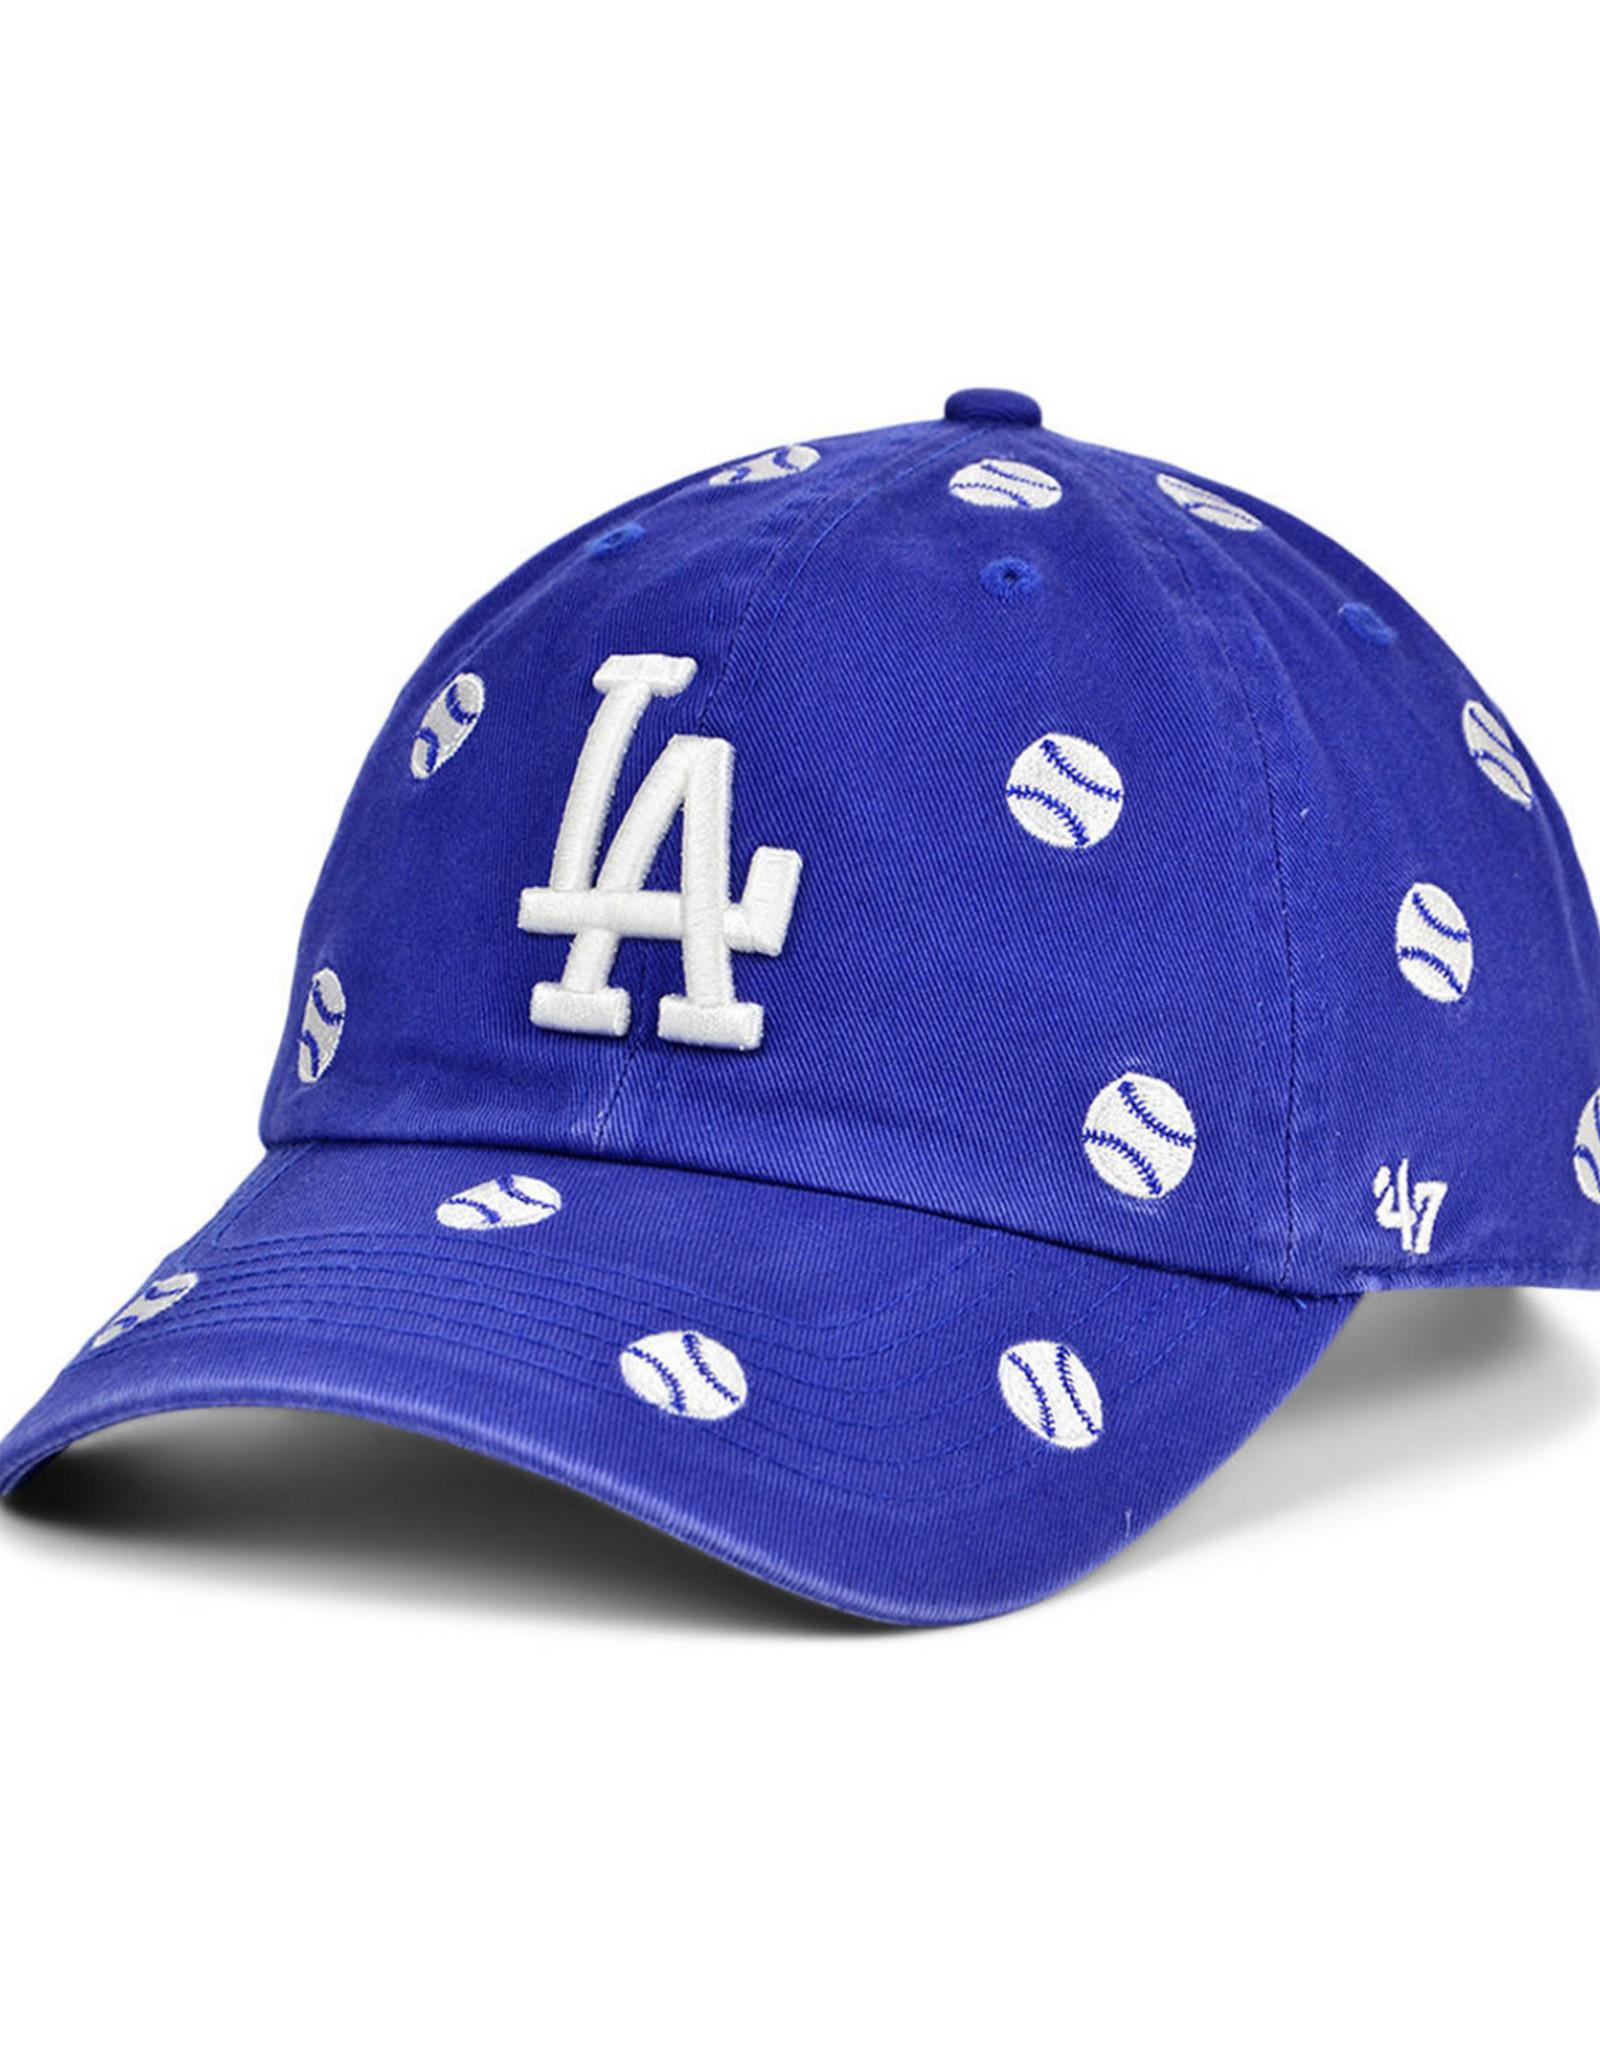 Los Angeles Dodgers Los Angeles Dodgers Confetti Cap